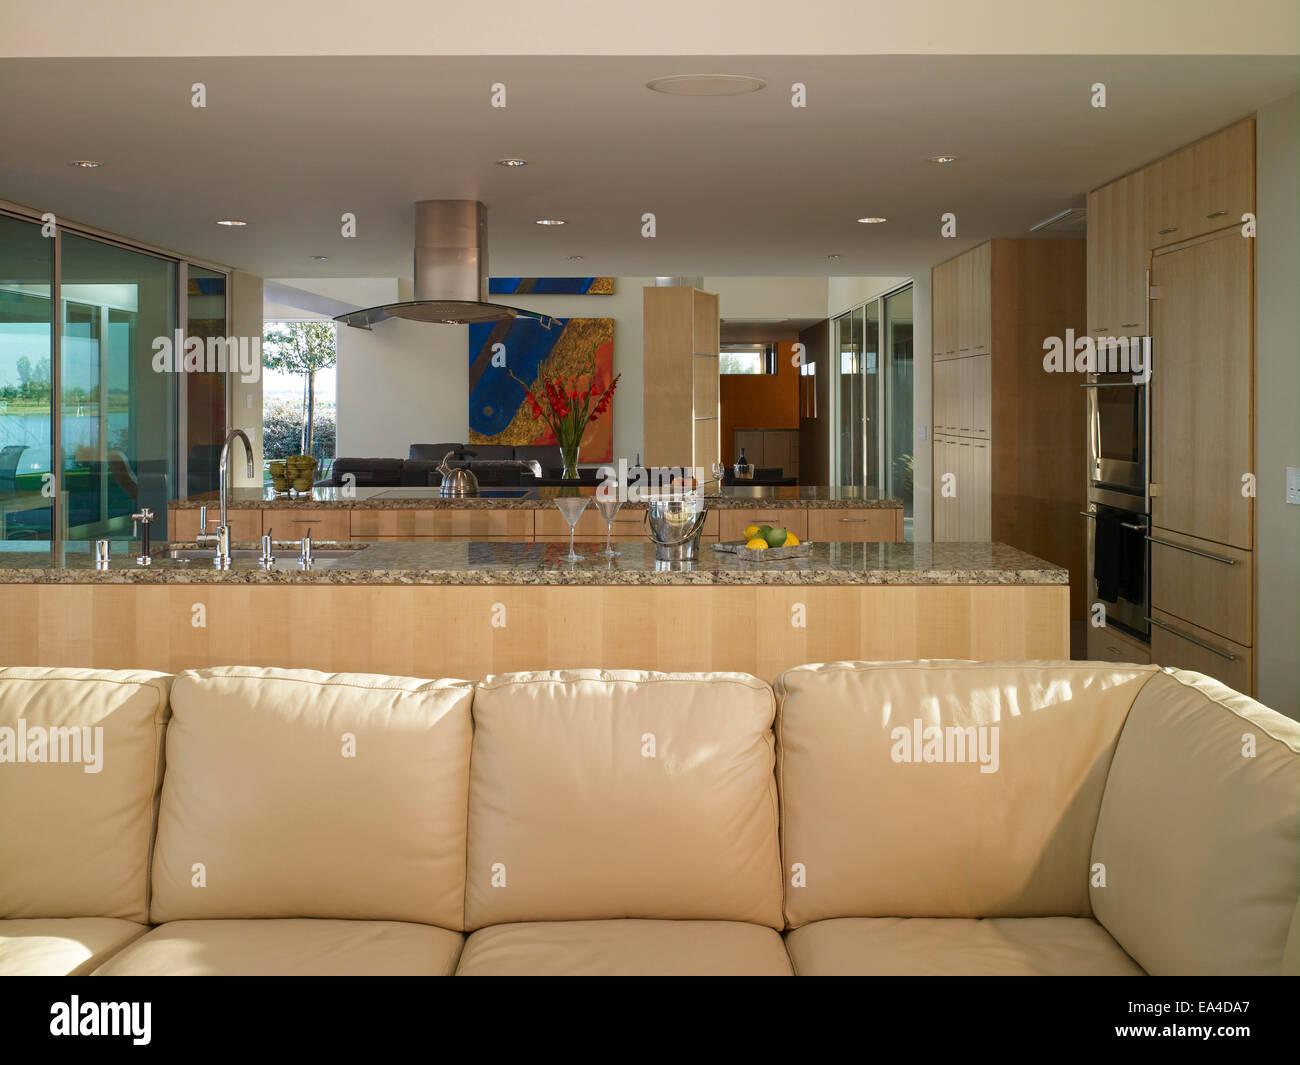 https://c8.alamy.com/comp/EA4DA7/open-plan-kitchen-and-living-room-of-border-house-arvin-california-EA4DA7.jpg